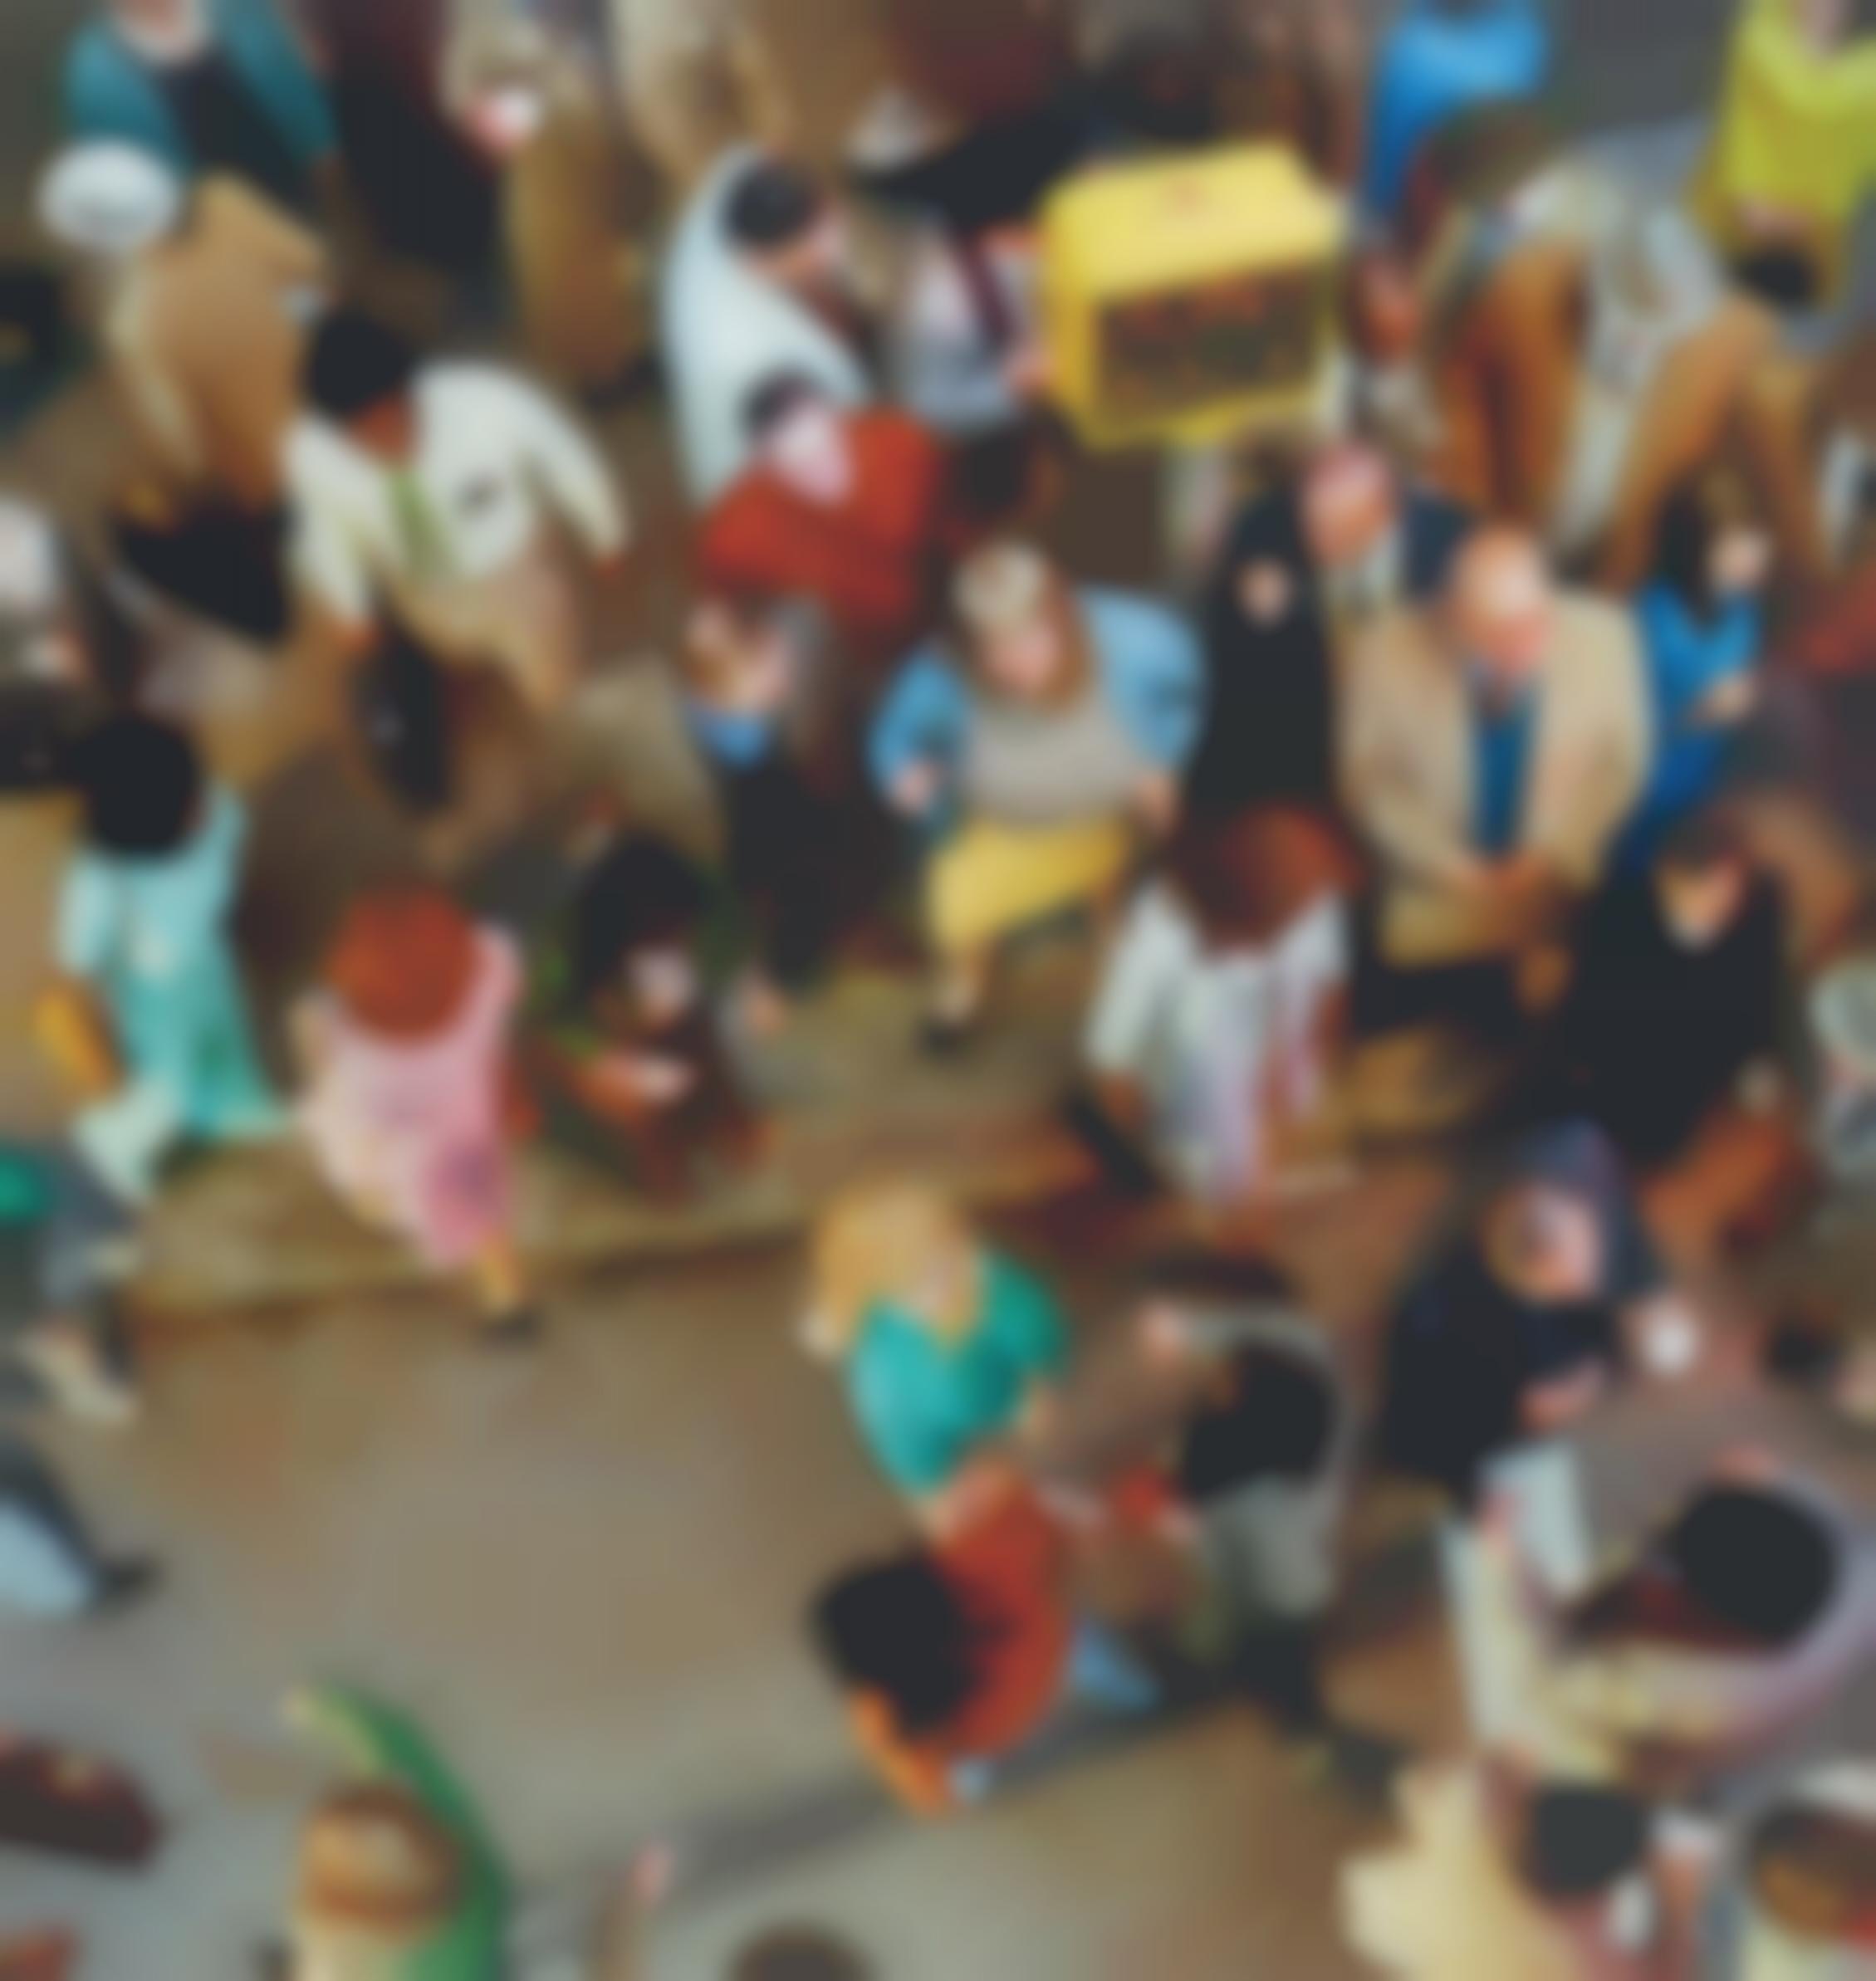 Alex Prager-Crowd #11 (Cedar And Broad Street)-2013